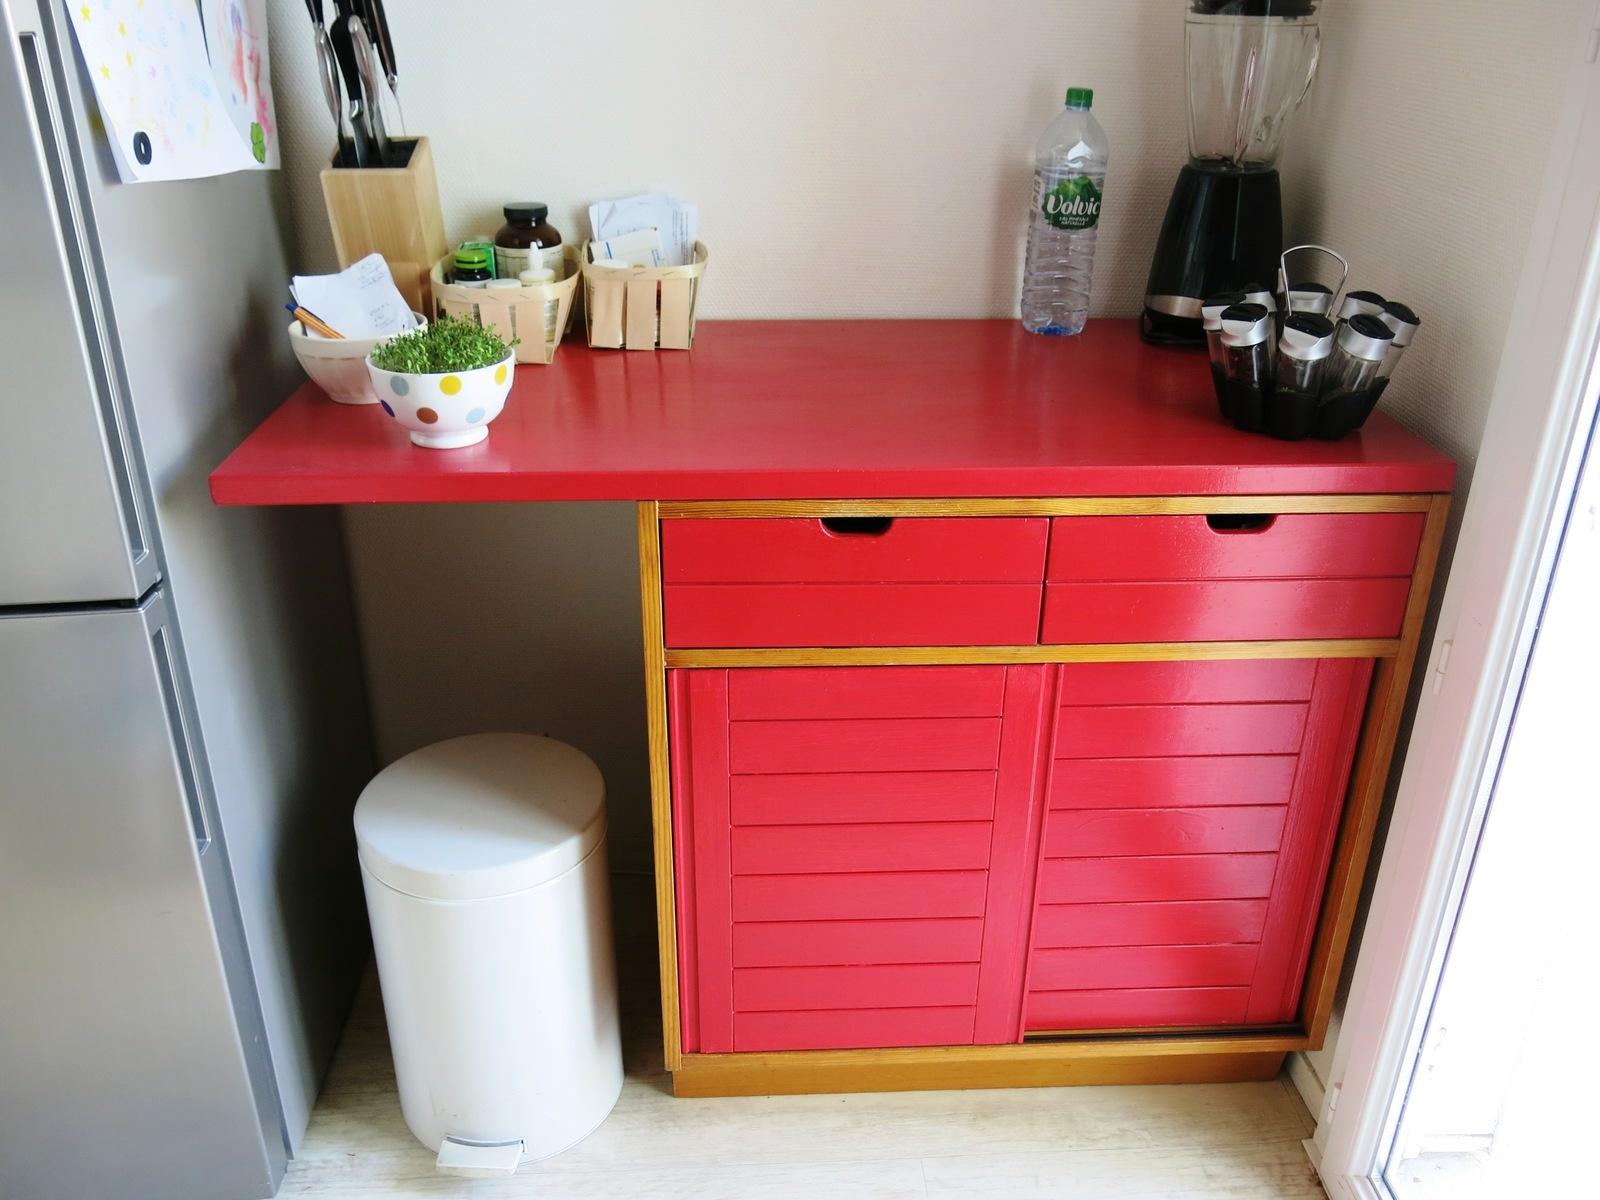 Mon comptoir de cuisine repeint